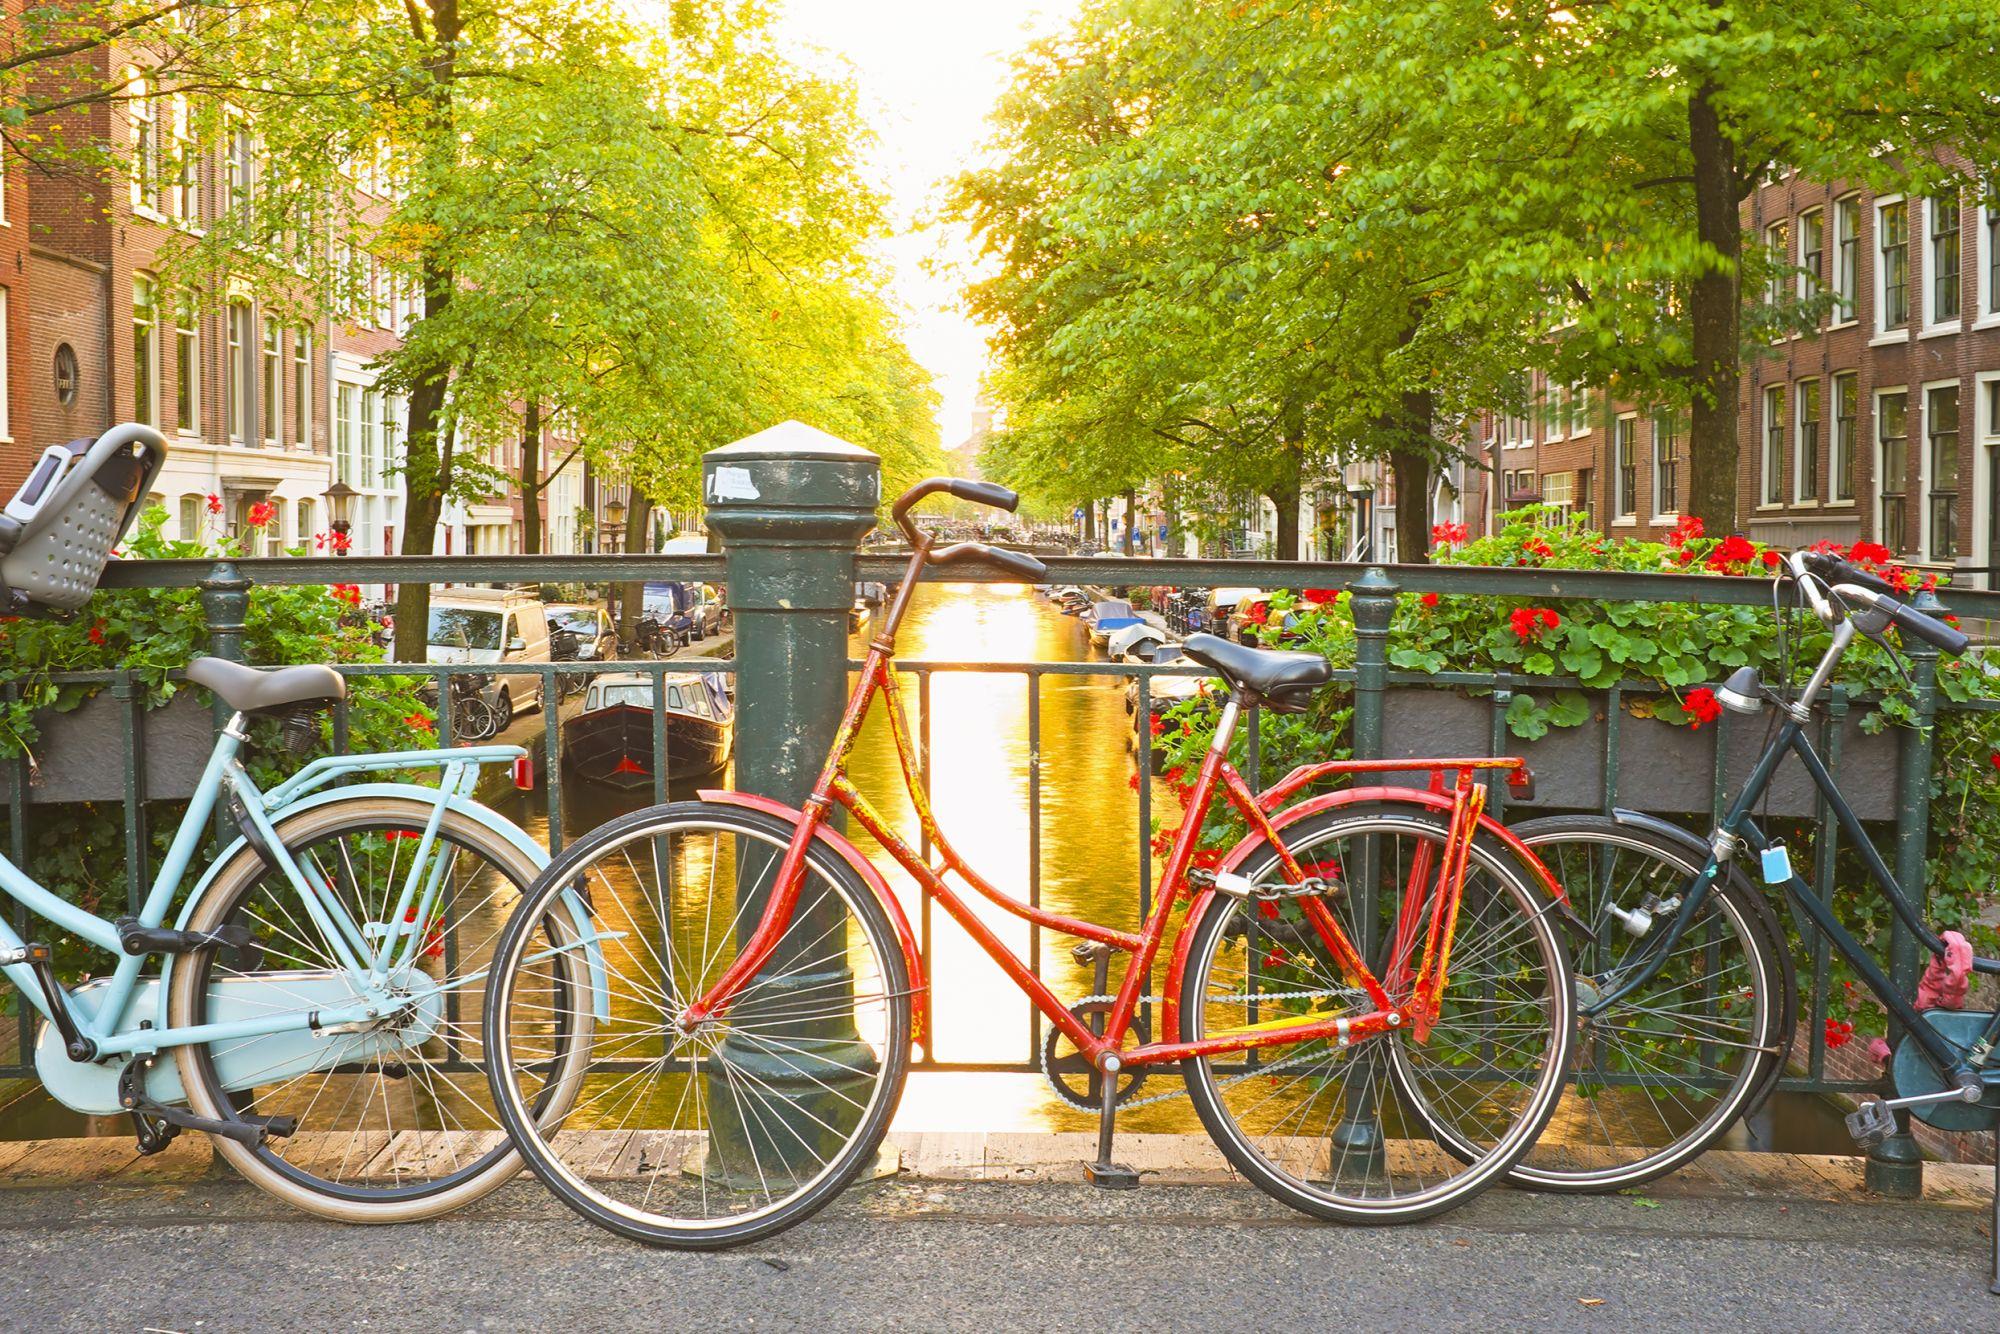 Amsterdam rowery nad kanałem